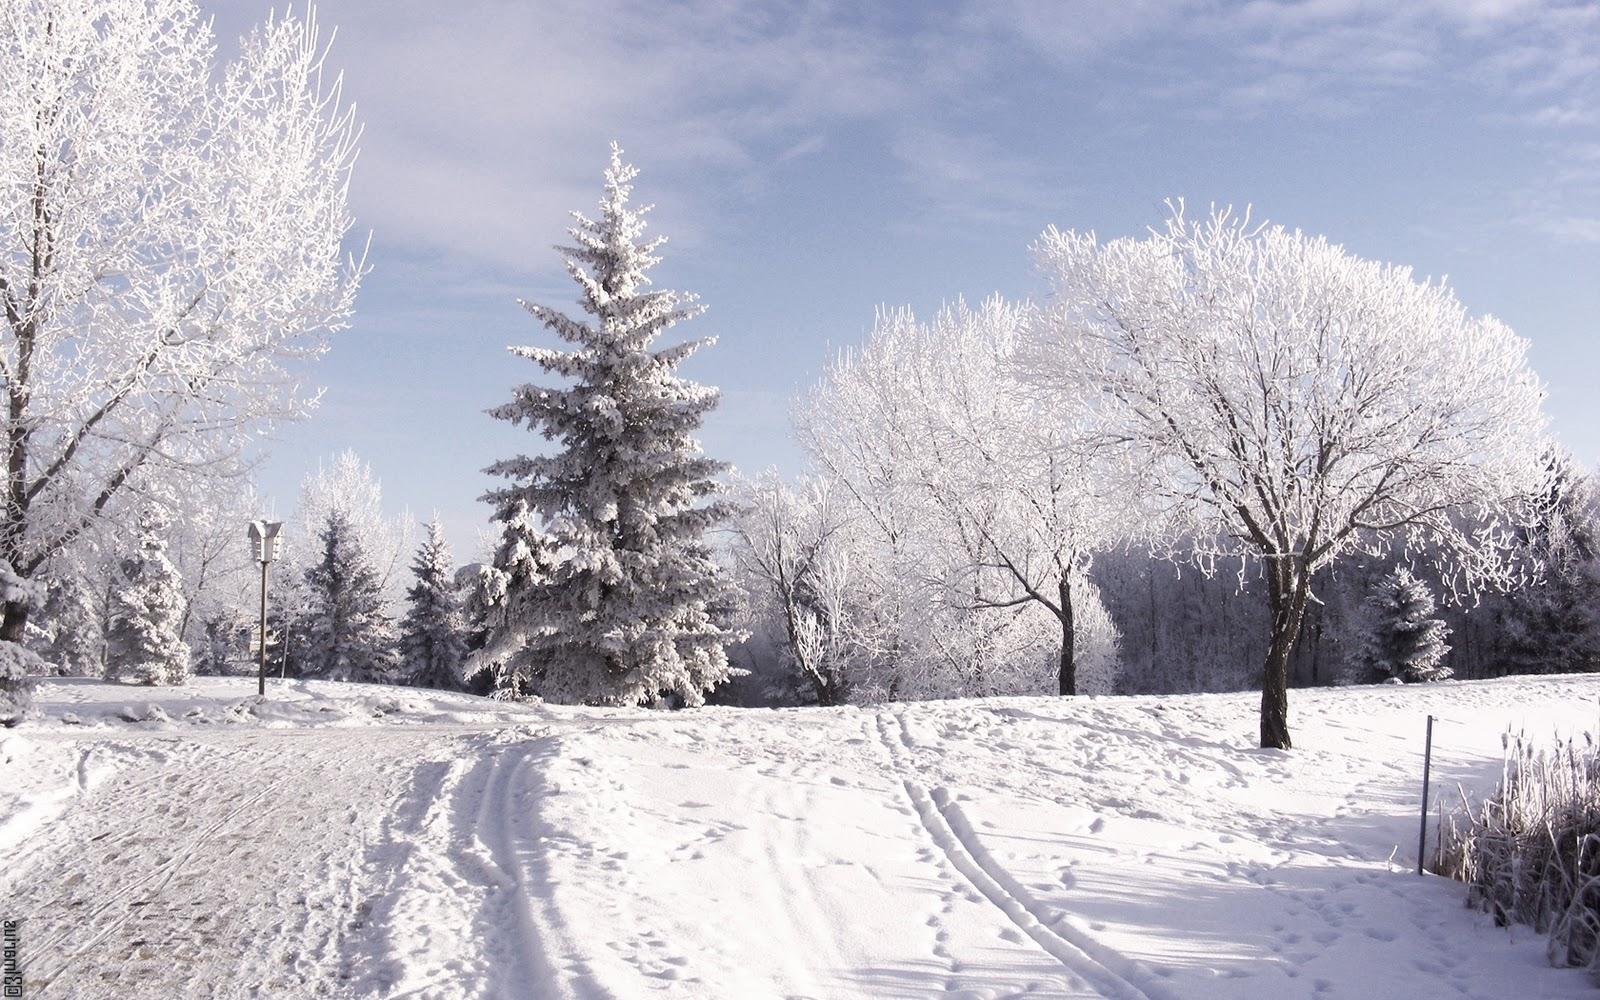 Pubg Snow Wallpaper Hd: Snow HD Wallpapers